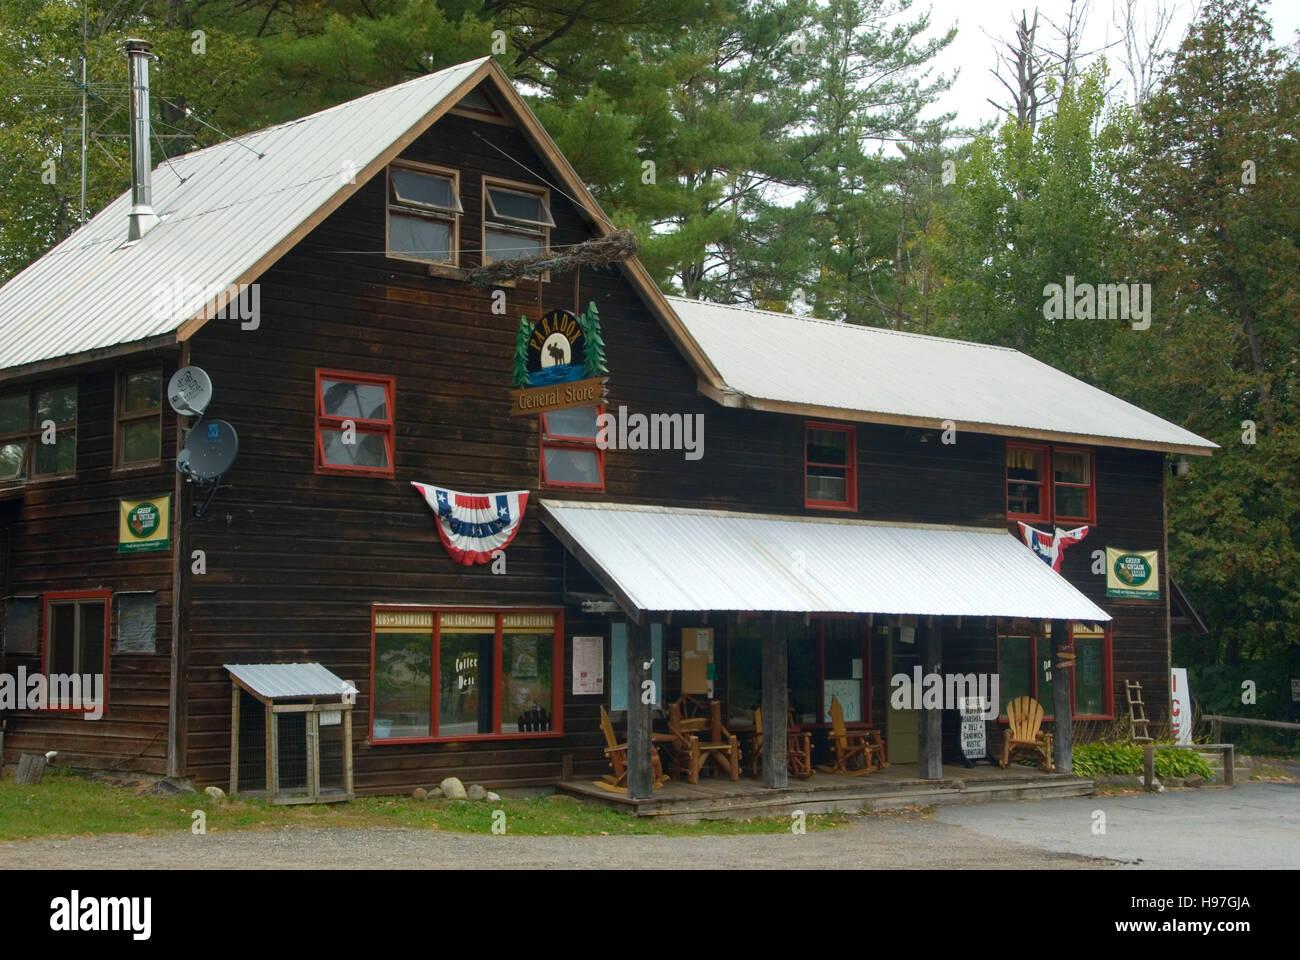 Paradox General Store, Adirondack Park, New York Stock Photo